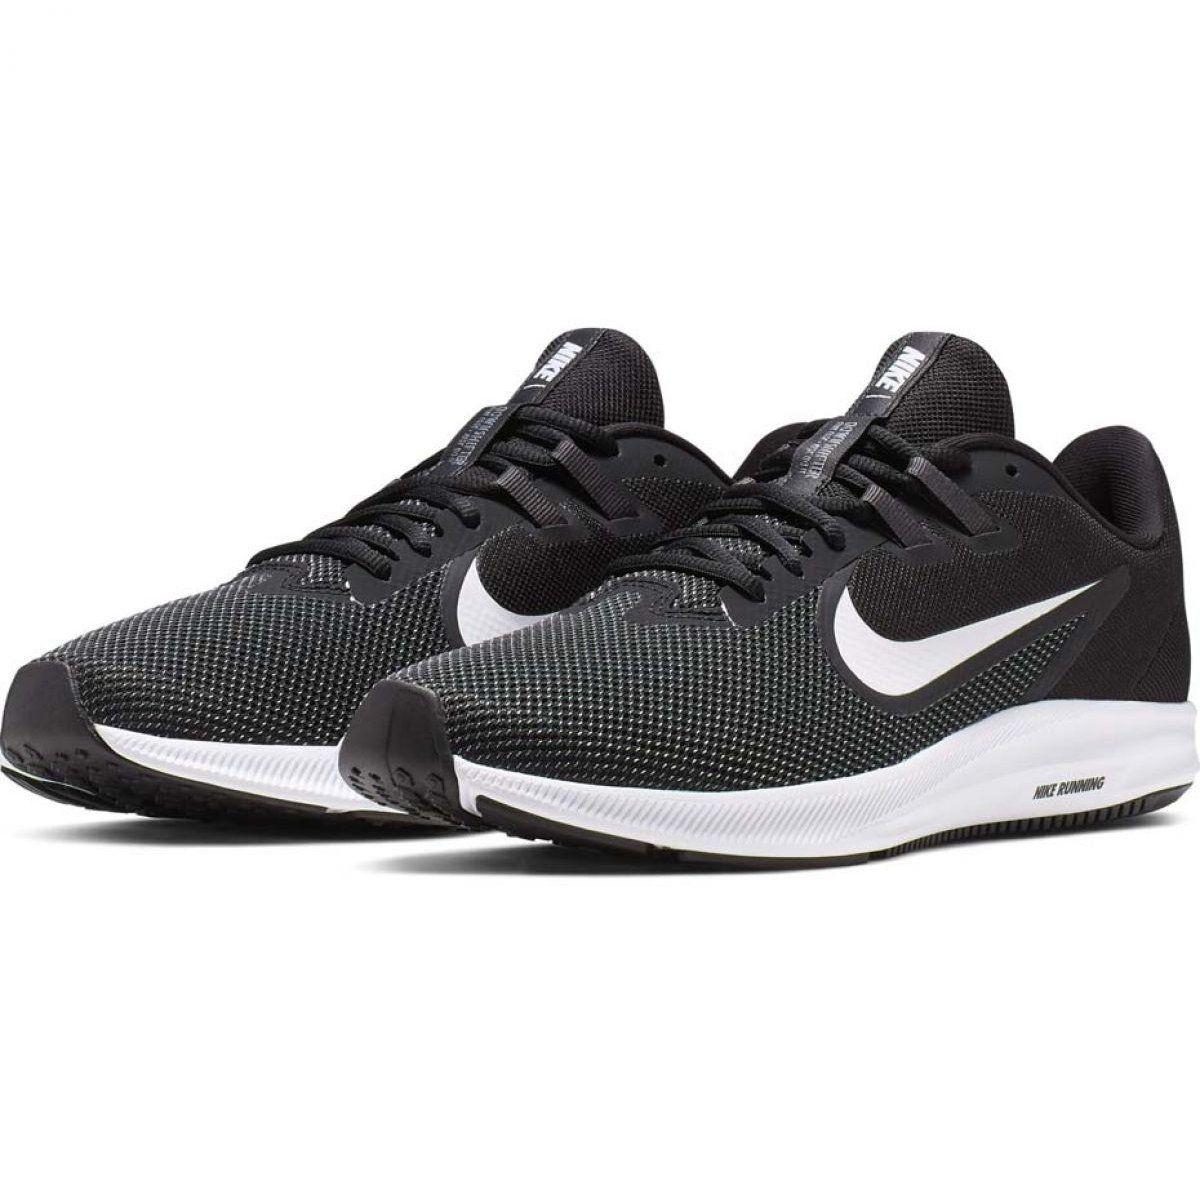 Buty Biegowe Nike Downshifter 9 M Aq7481 002 Czarne Running Shoes For Men Running Shoes Best Running Shoes